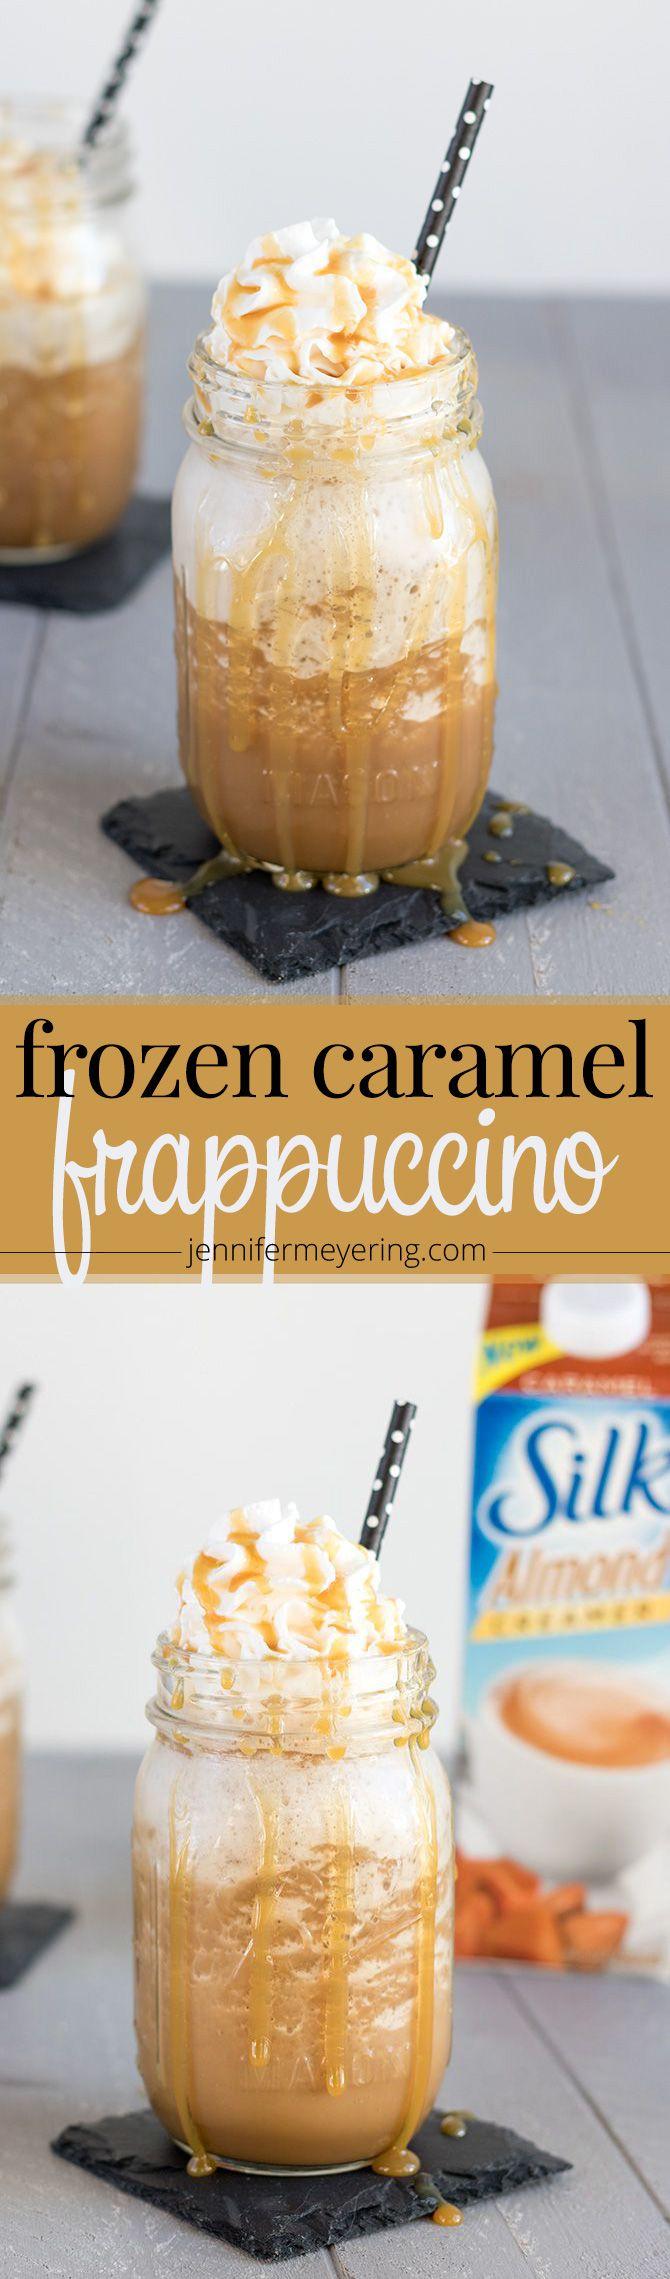 Best 25+ Caramel frappuccino ideas on Pinterest : Starbucks caramel frappuccino, Frappuccino ...